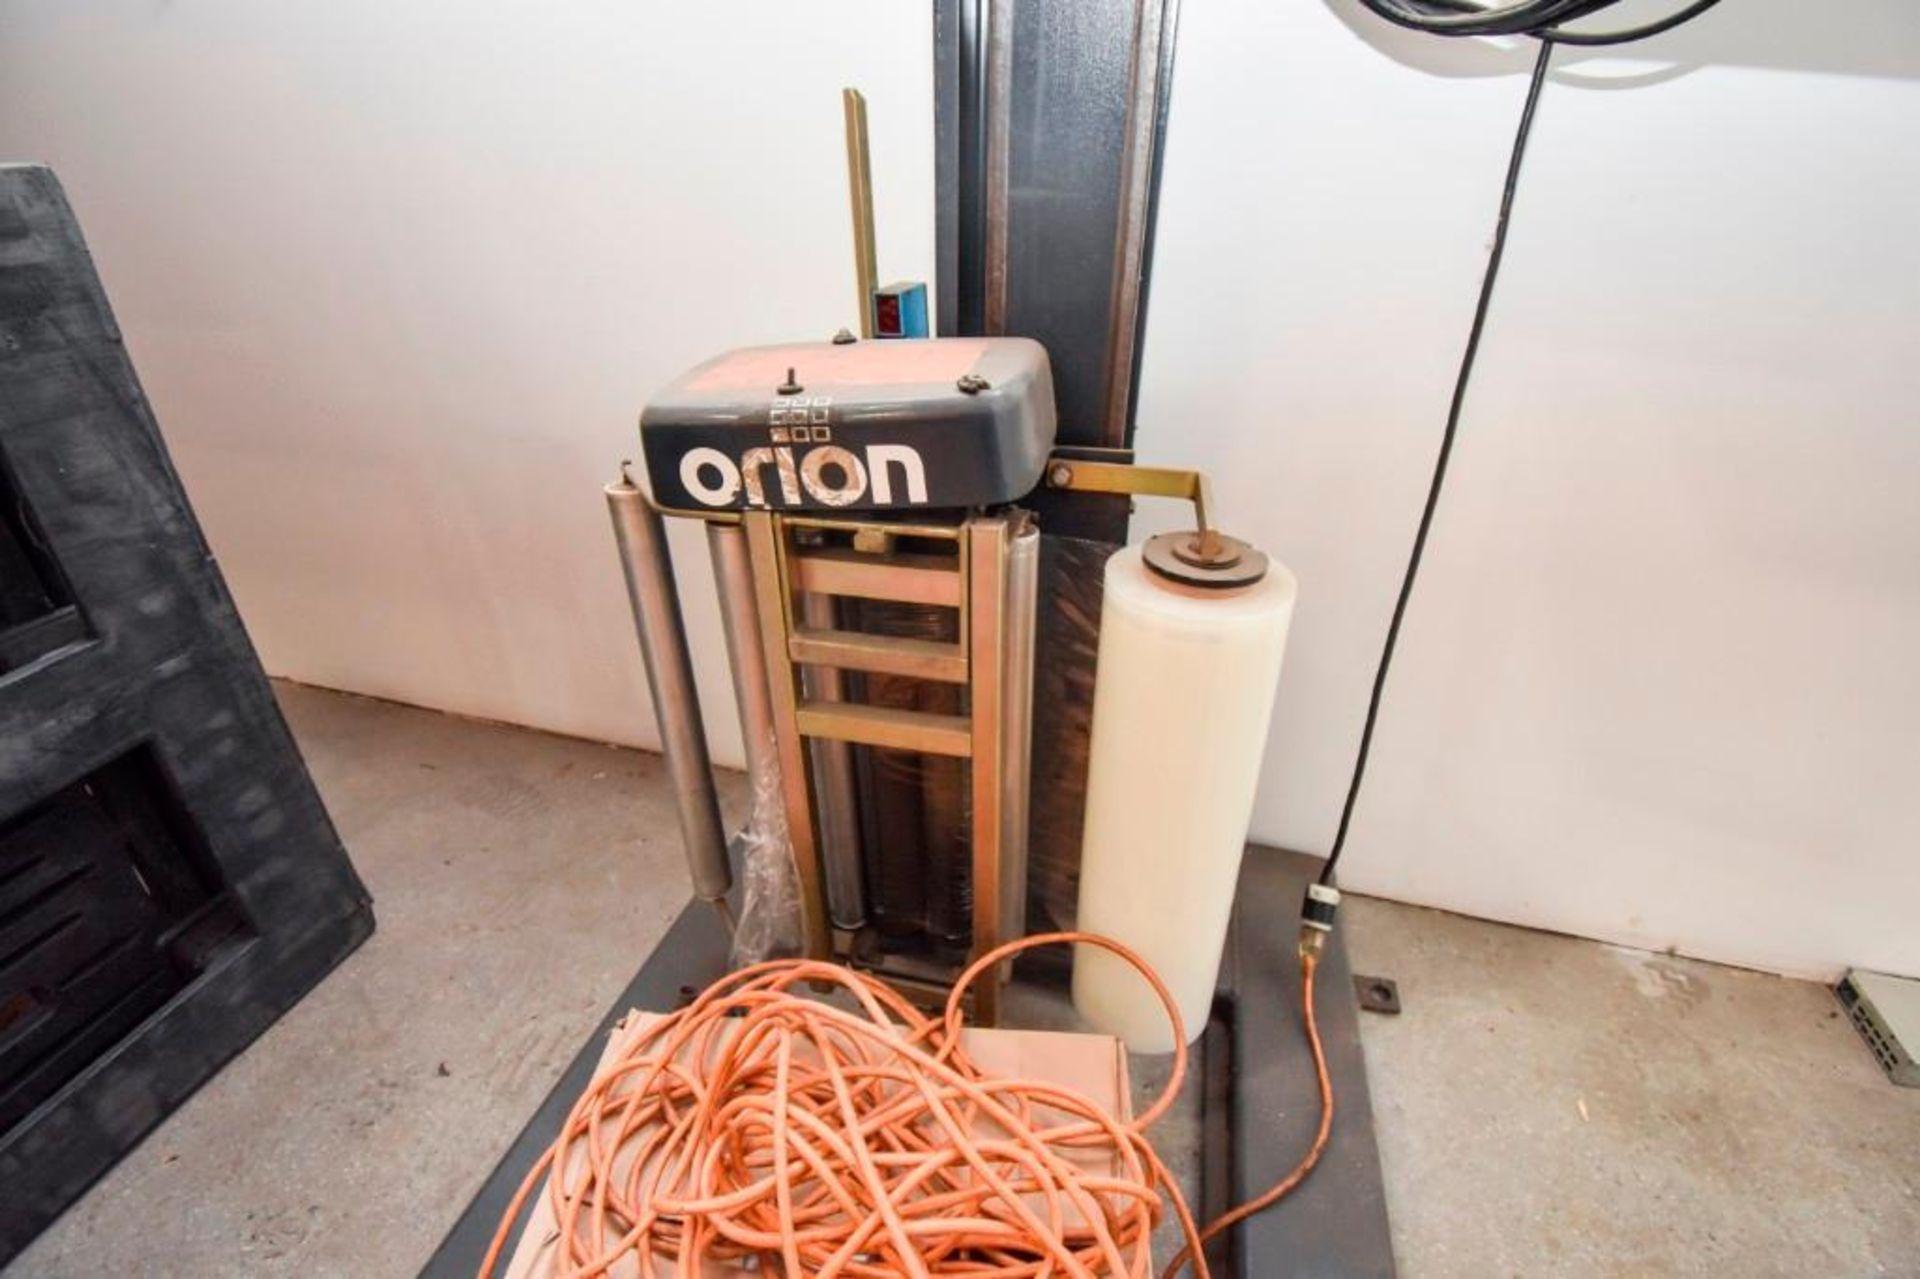 Orion Pallet Wrapper - Image 4 of 9